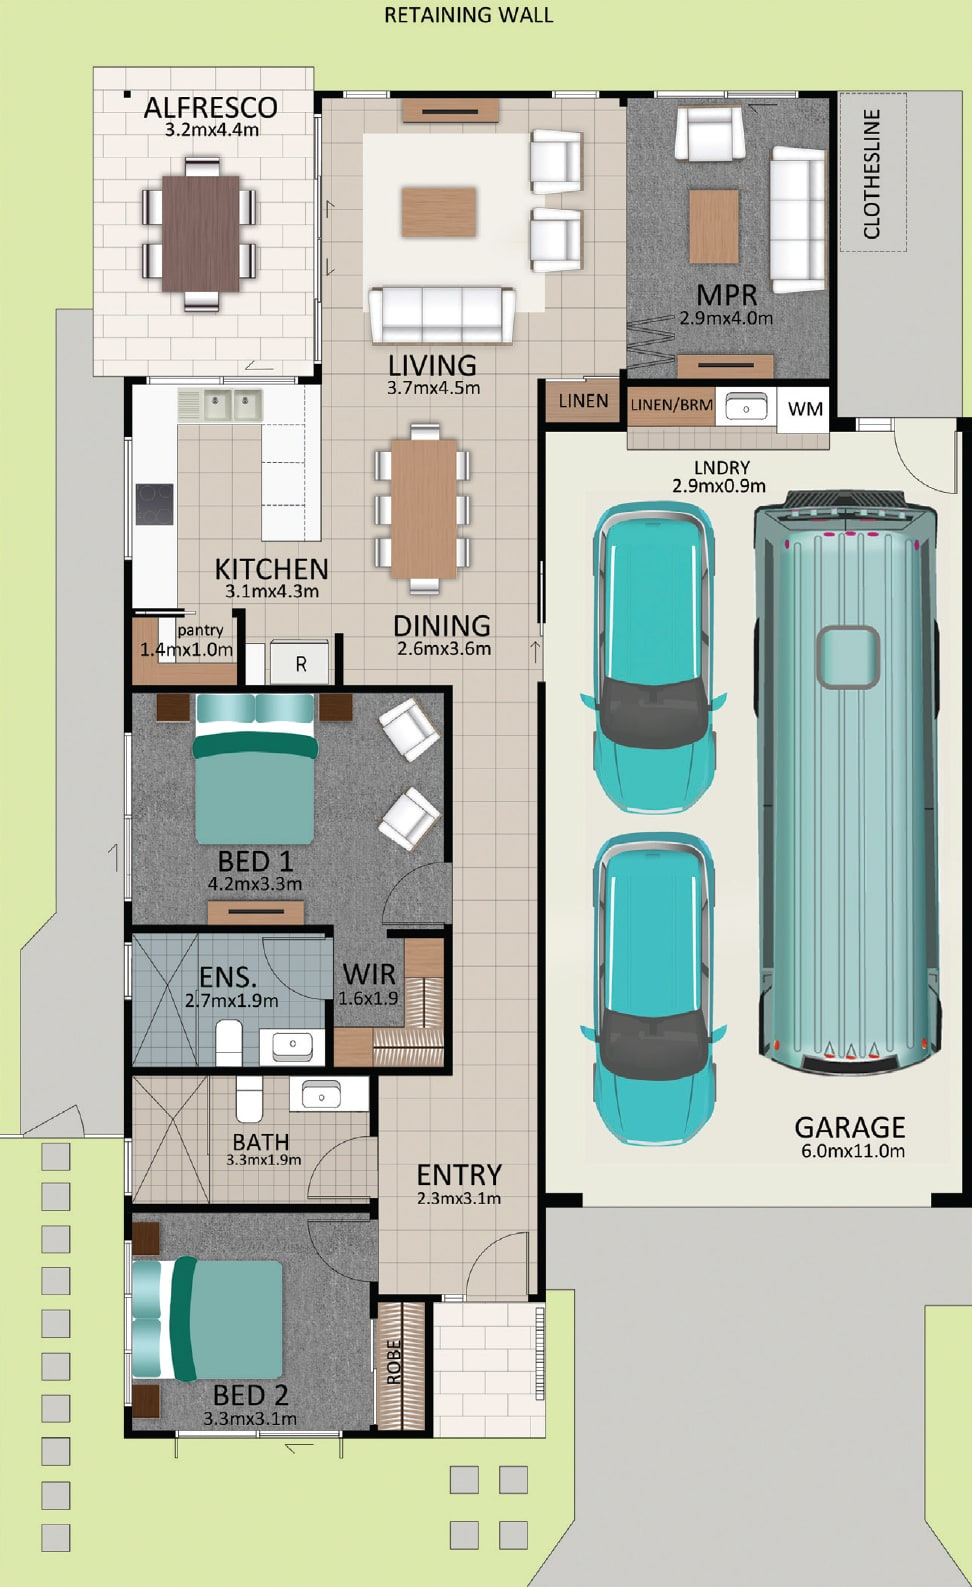 LAT25 Floorplan GAL LOT 235 FEB2021 V1 - Lot 235